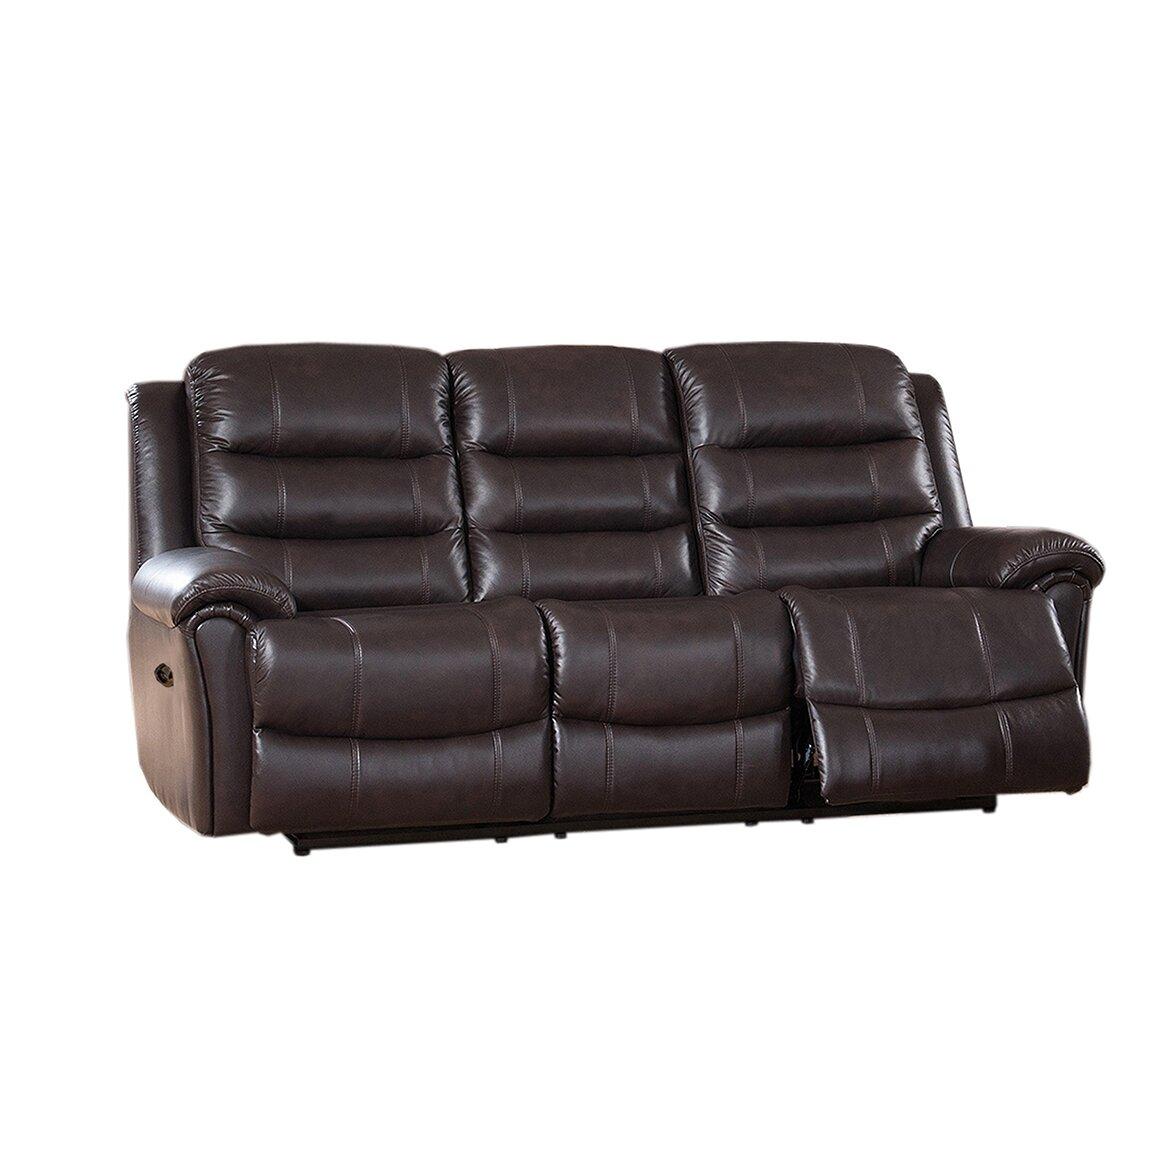 Astoria Leather Recliner Sofa And Loveseat Set Wayfair